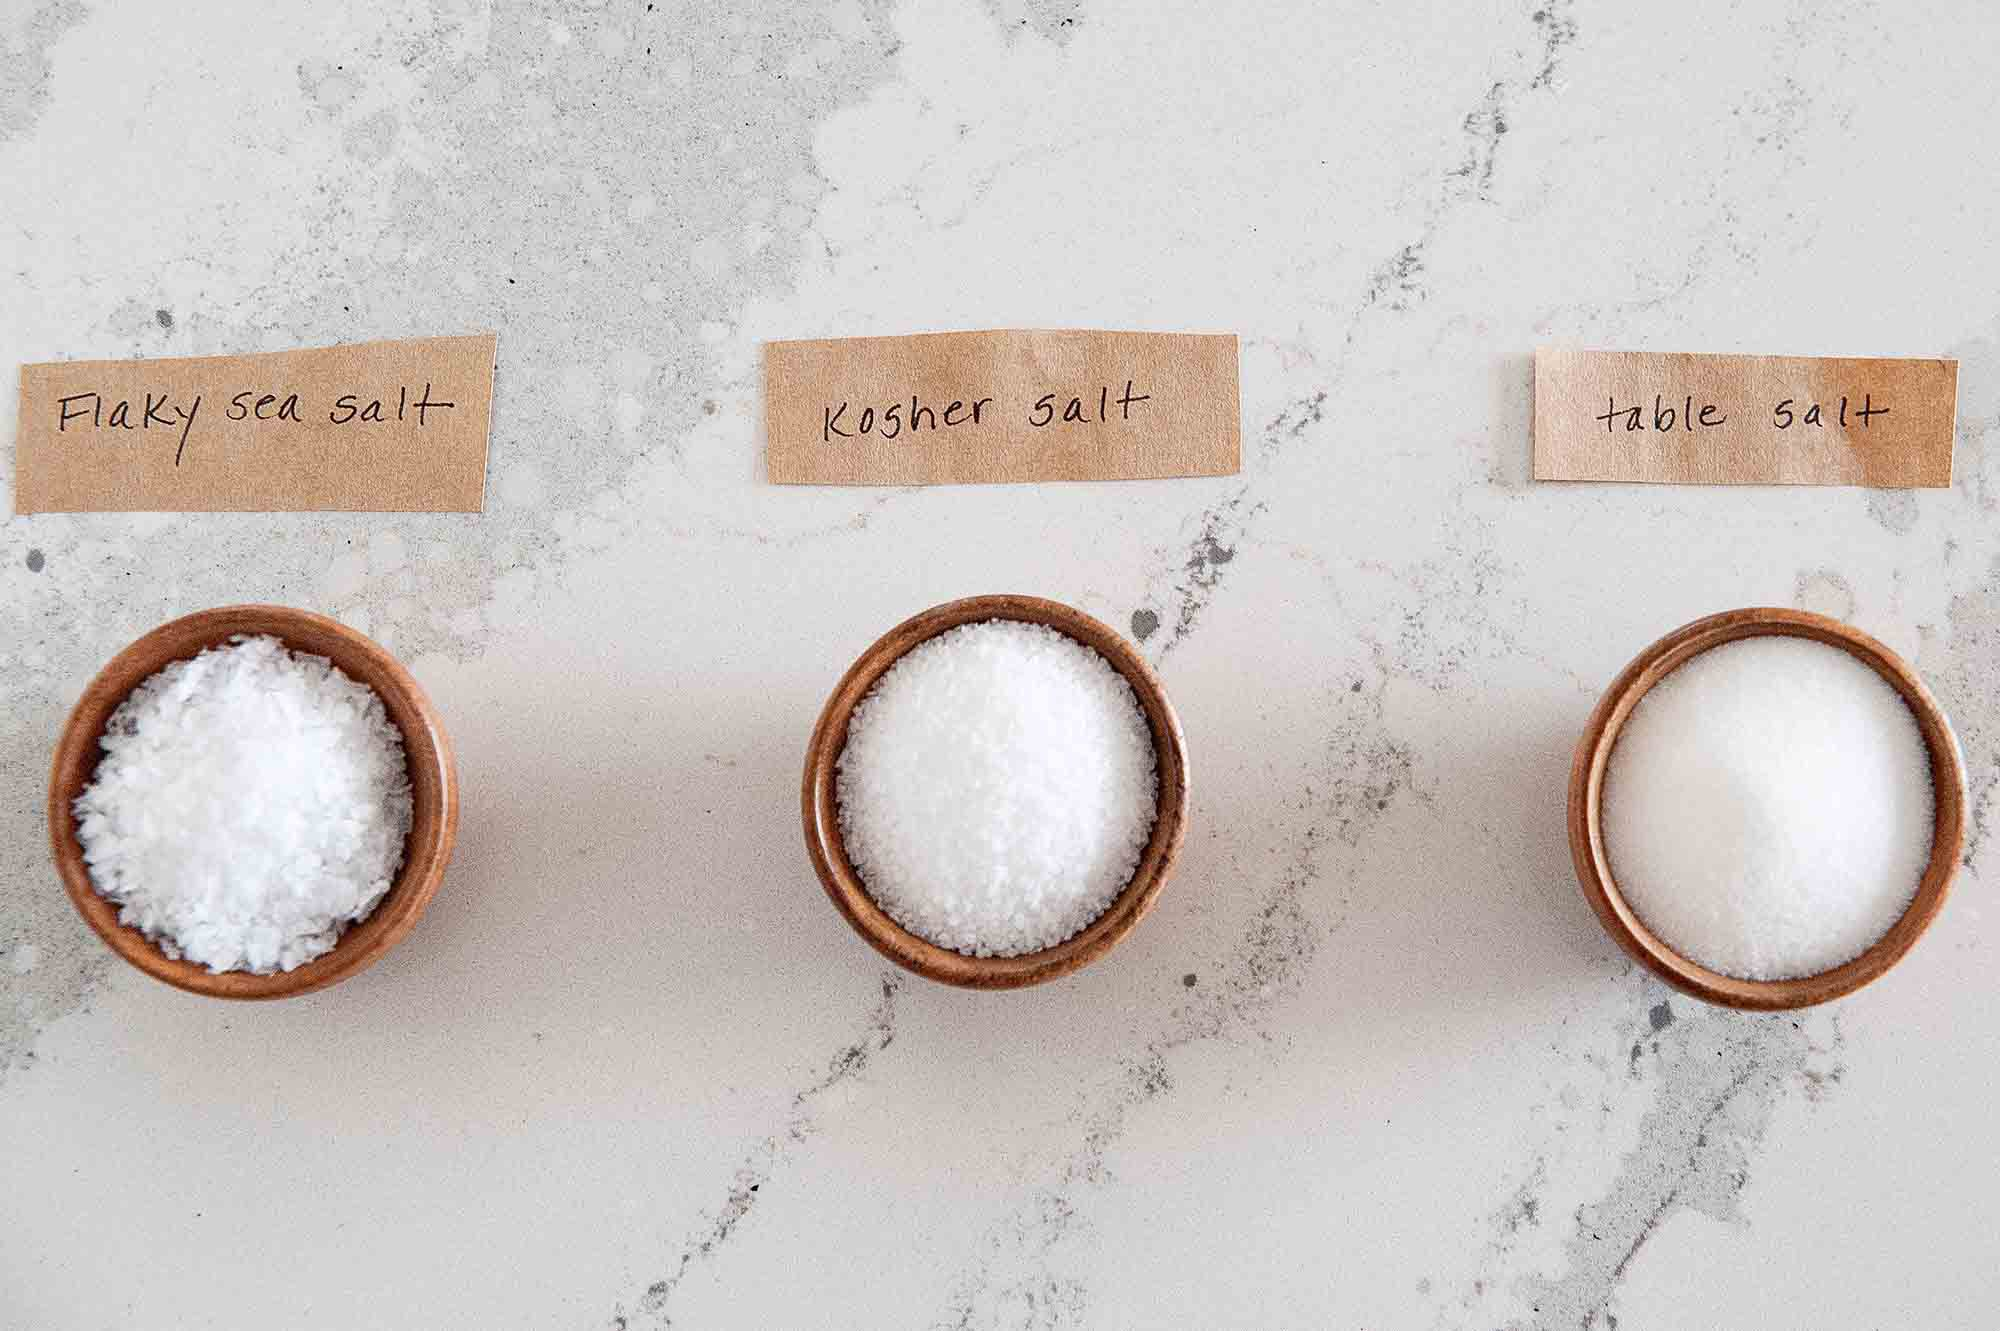 Three wooden bowls filled with kosher salt, table salt and flaky sea salt